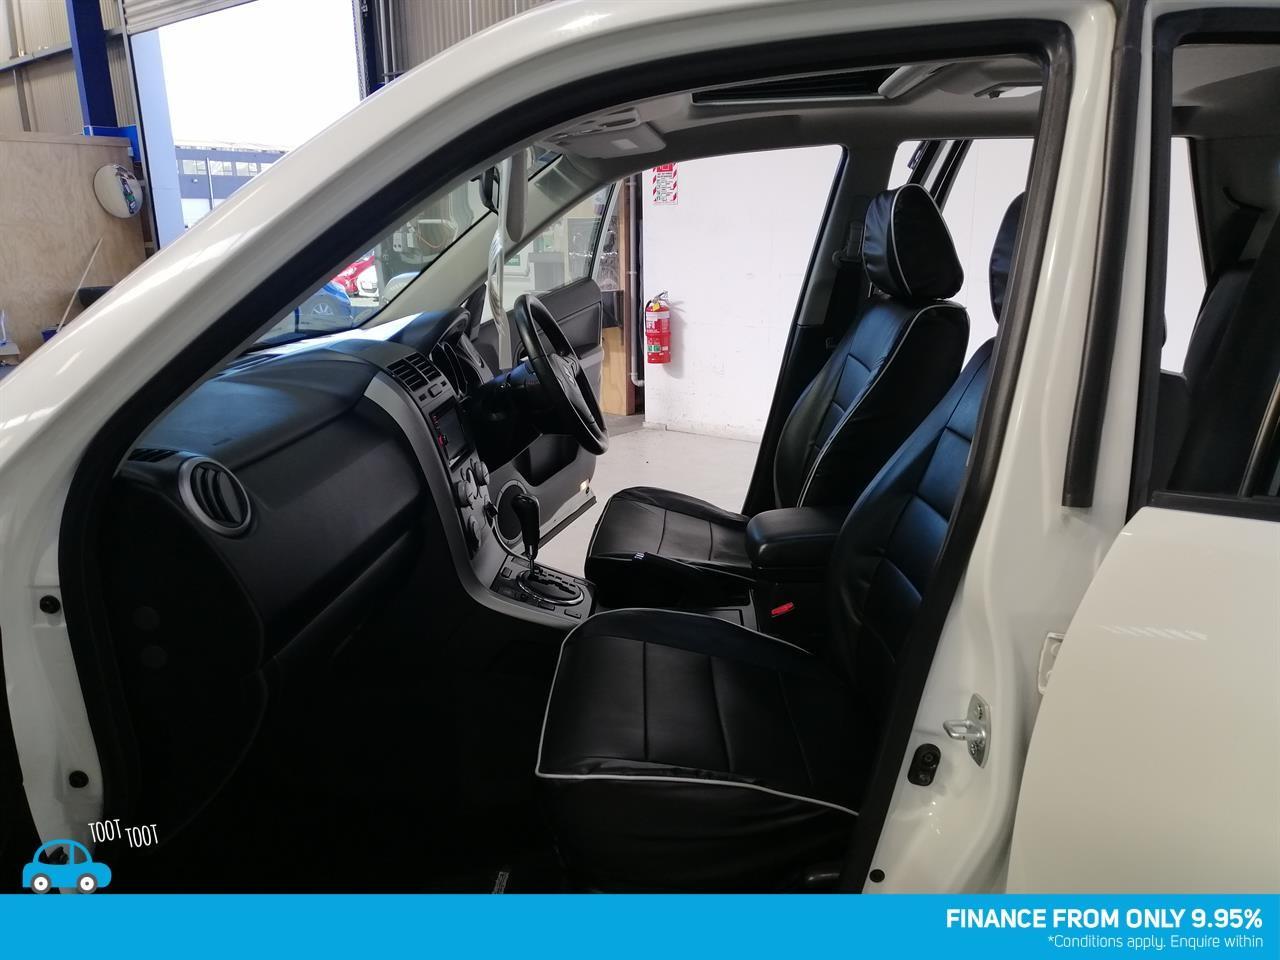 image-10, 2013 Suzuki ESCUDO CROSS ADVENTURE at Dunedin